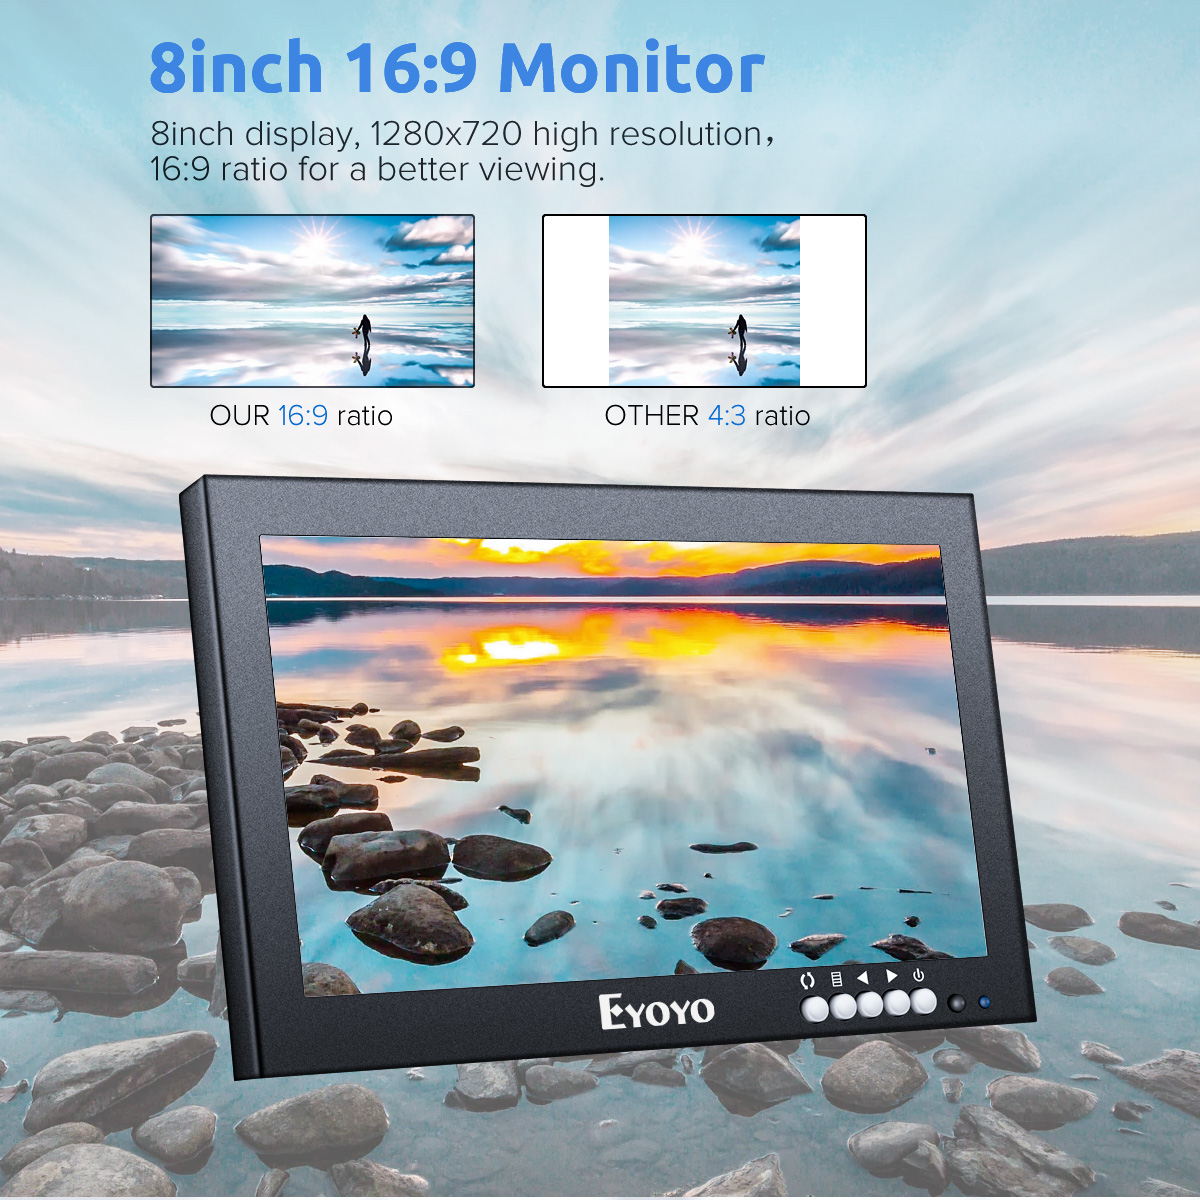 Eyoyo 8 inch Small HDMI LCD Monitor, Portable 1280x720 16:9 IPS Metal Housing Screen Support HDMI/VGA/AV/BNC Input